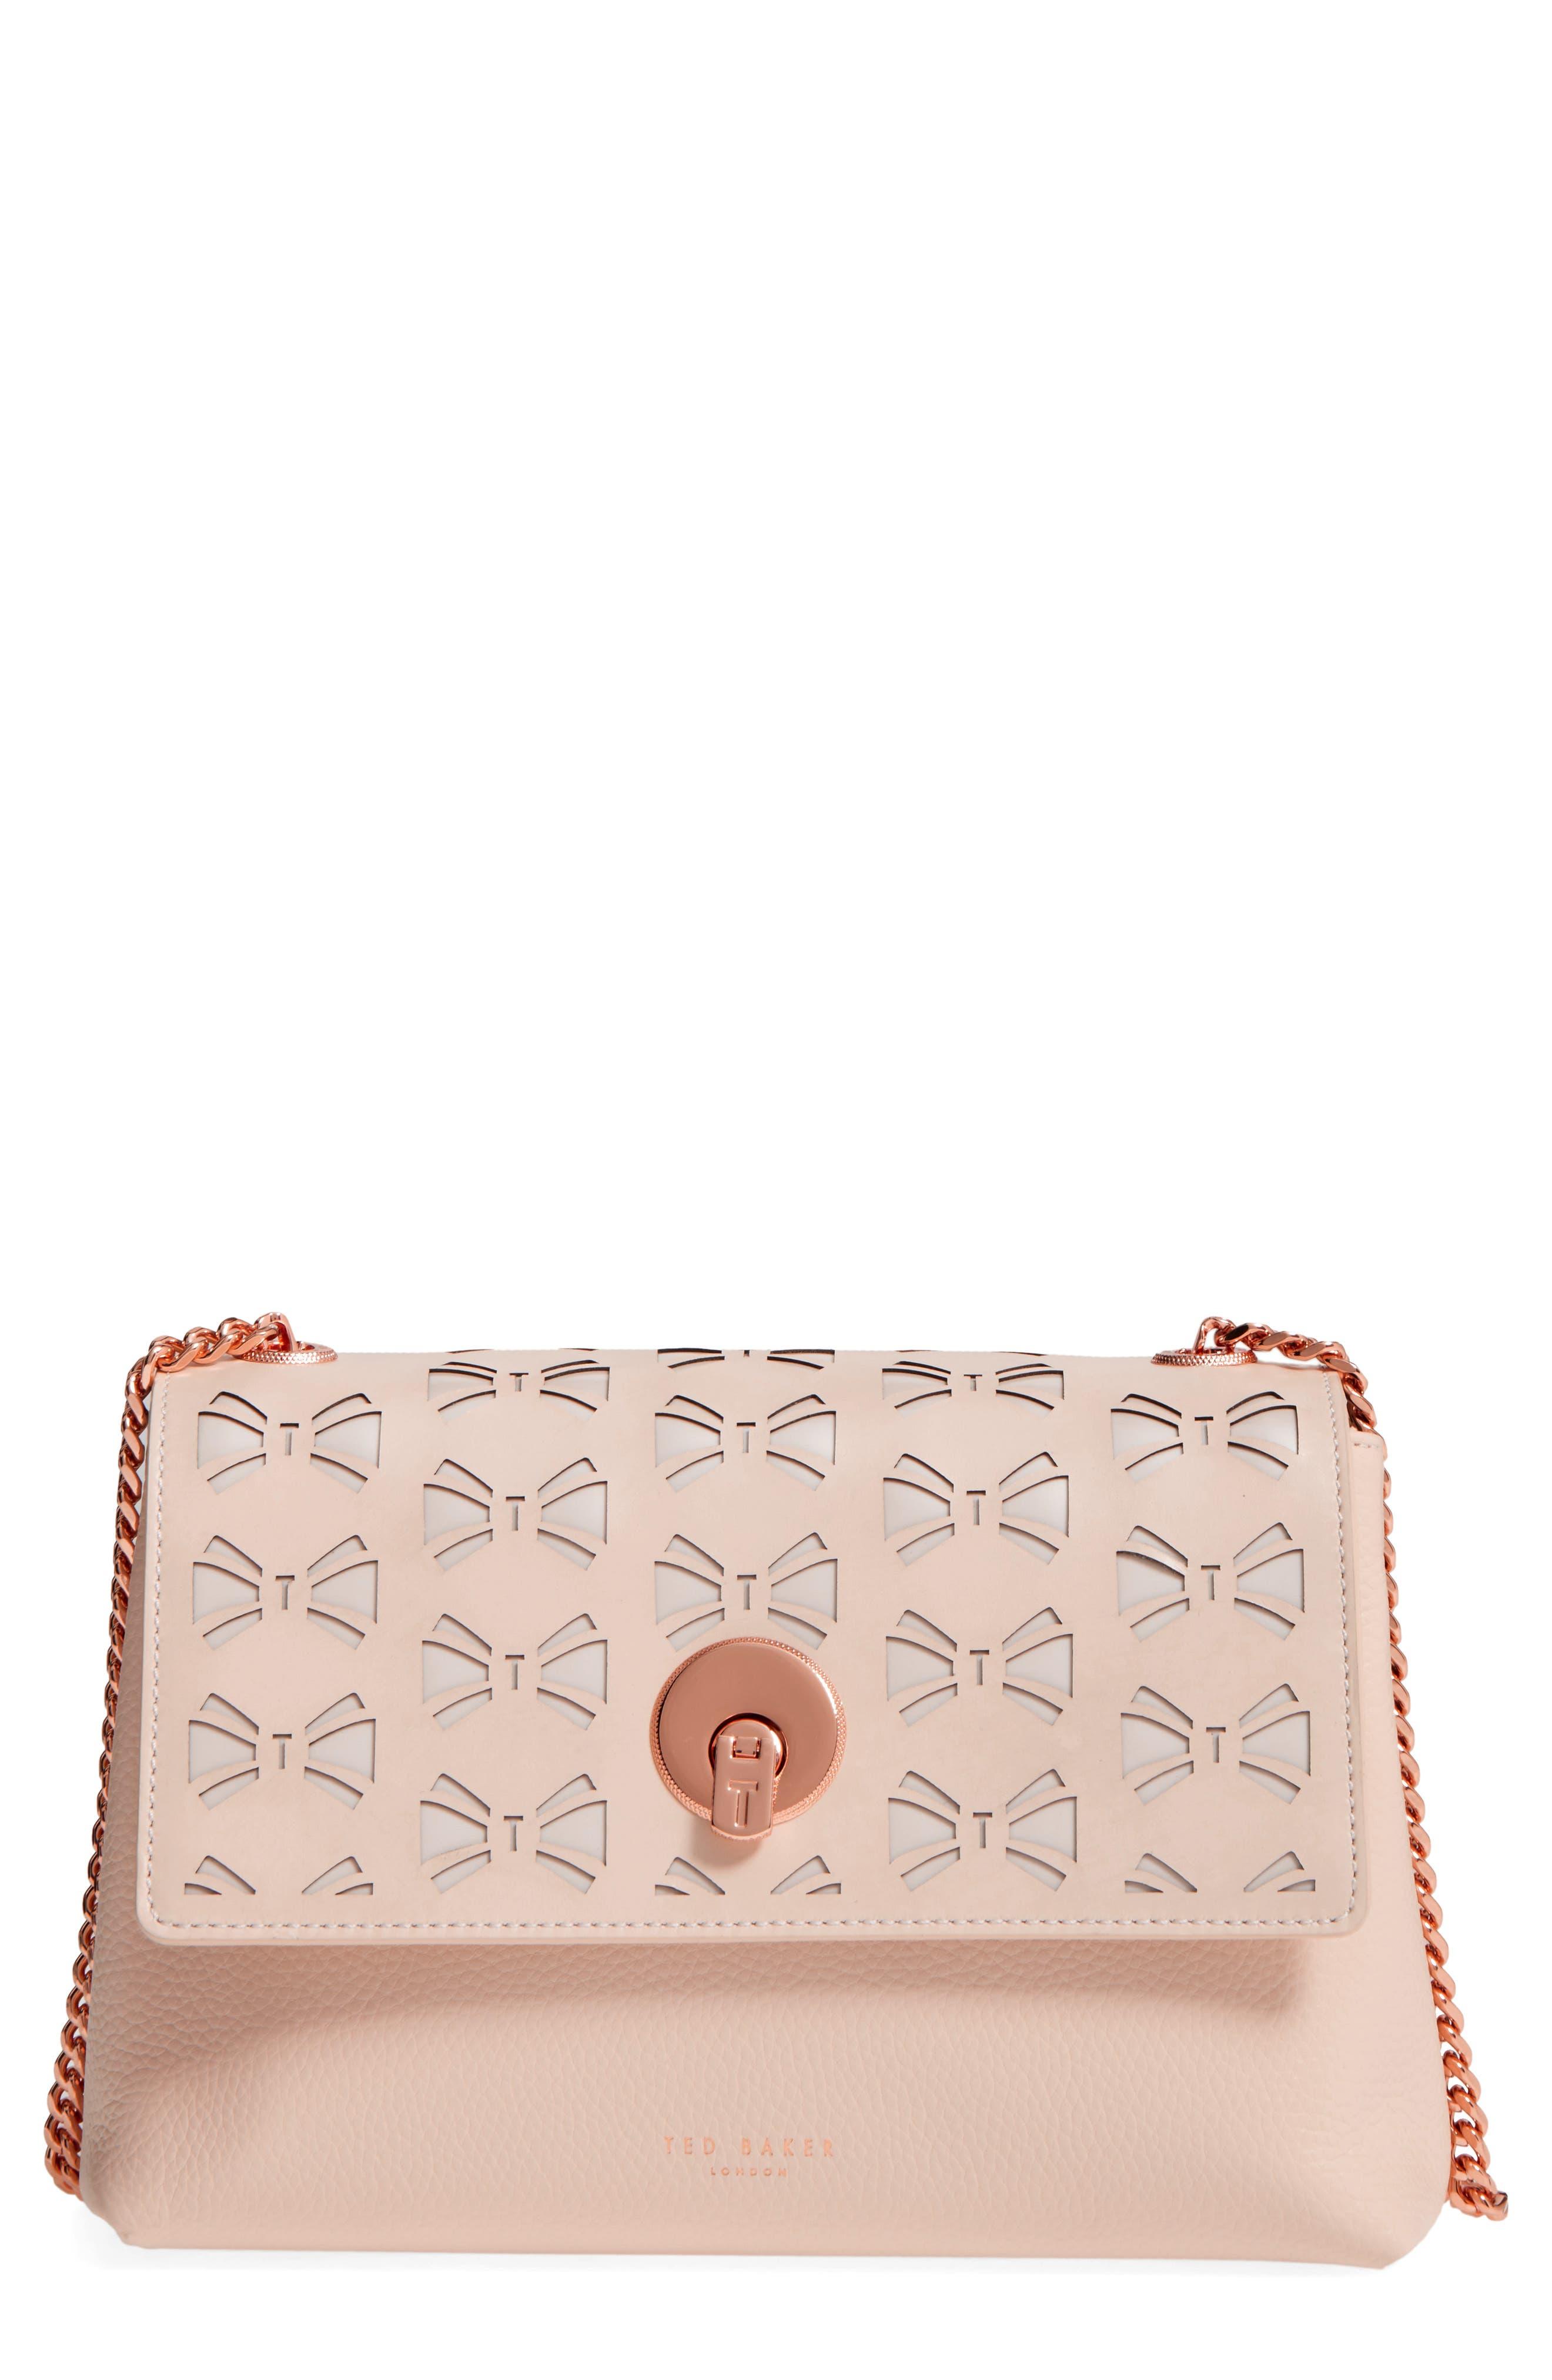 Main Image - Ted Baker London Leather Crossbody Bag